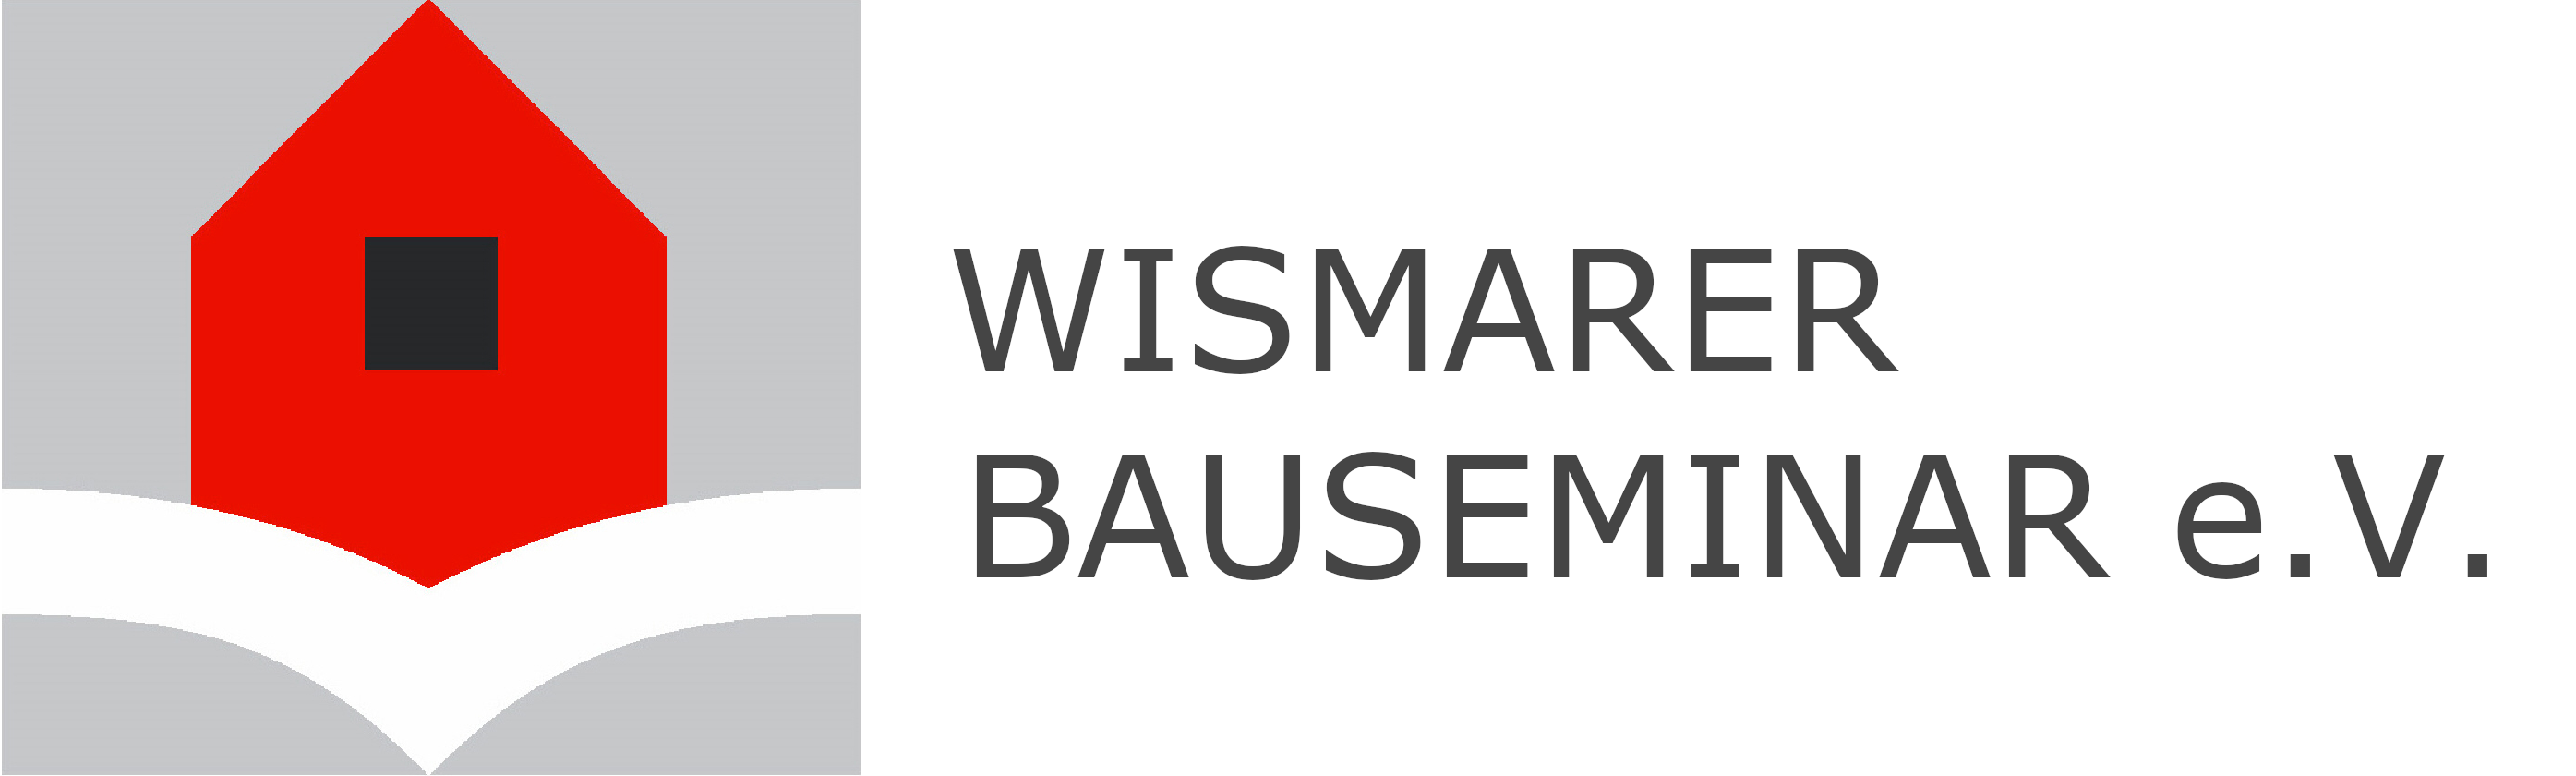 Wismarer Bauseminar e.V.